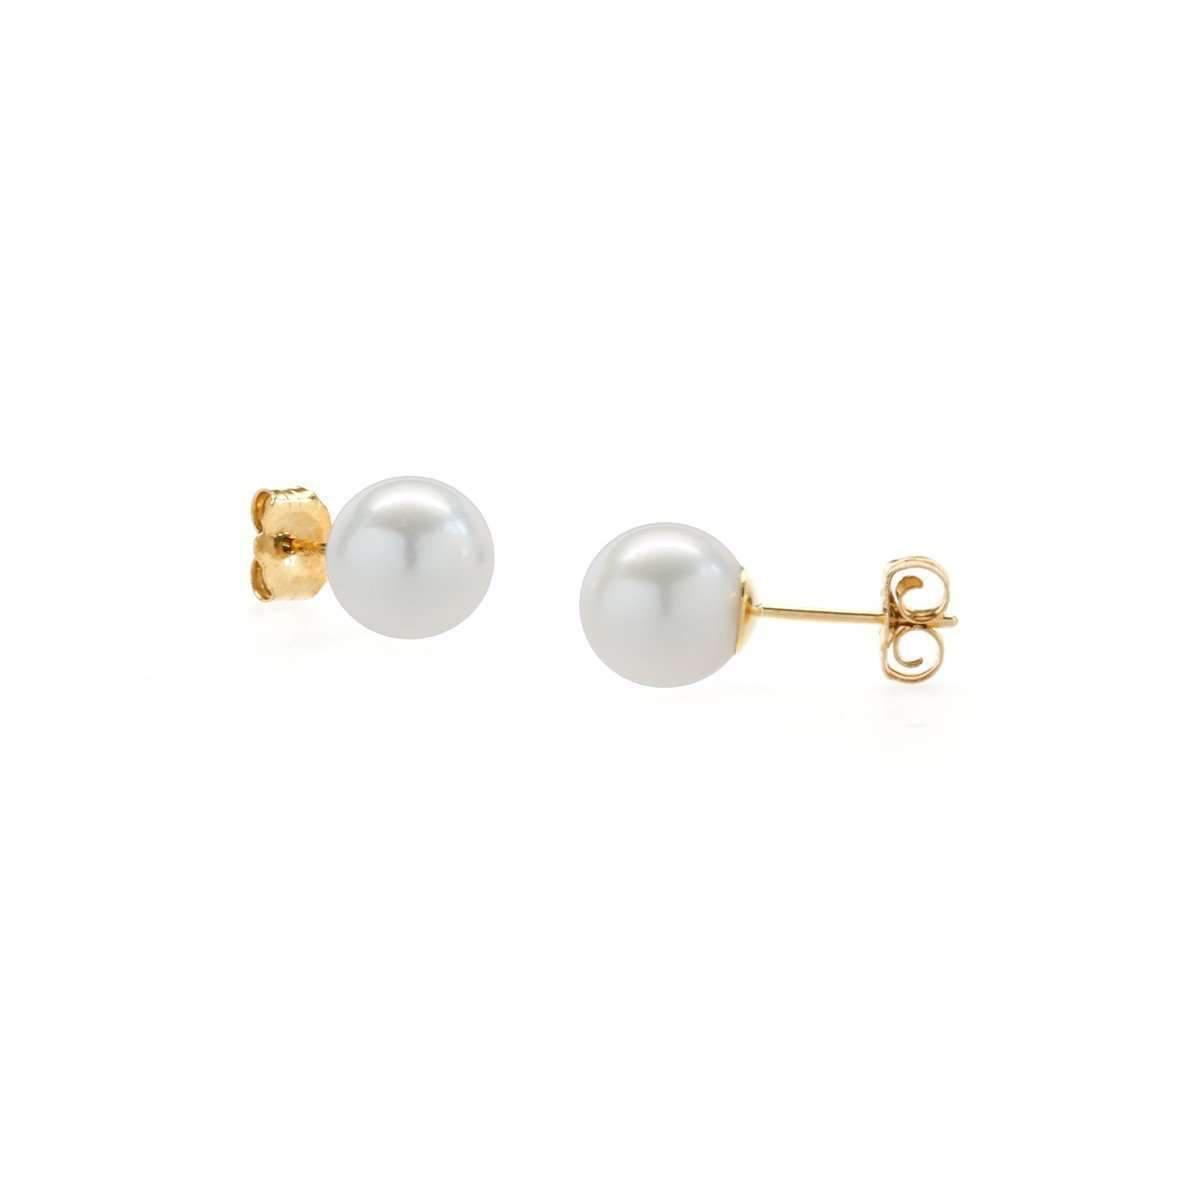 AAA Quality ISAAC WESTMAN 14K Gold White Japanese Akoya Cultured Pearl Earrings